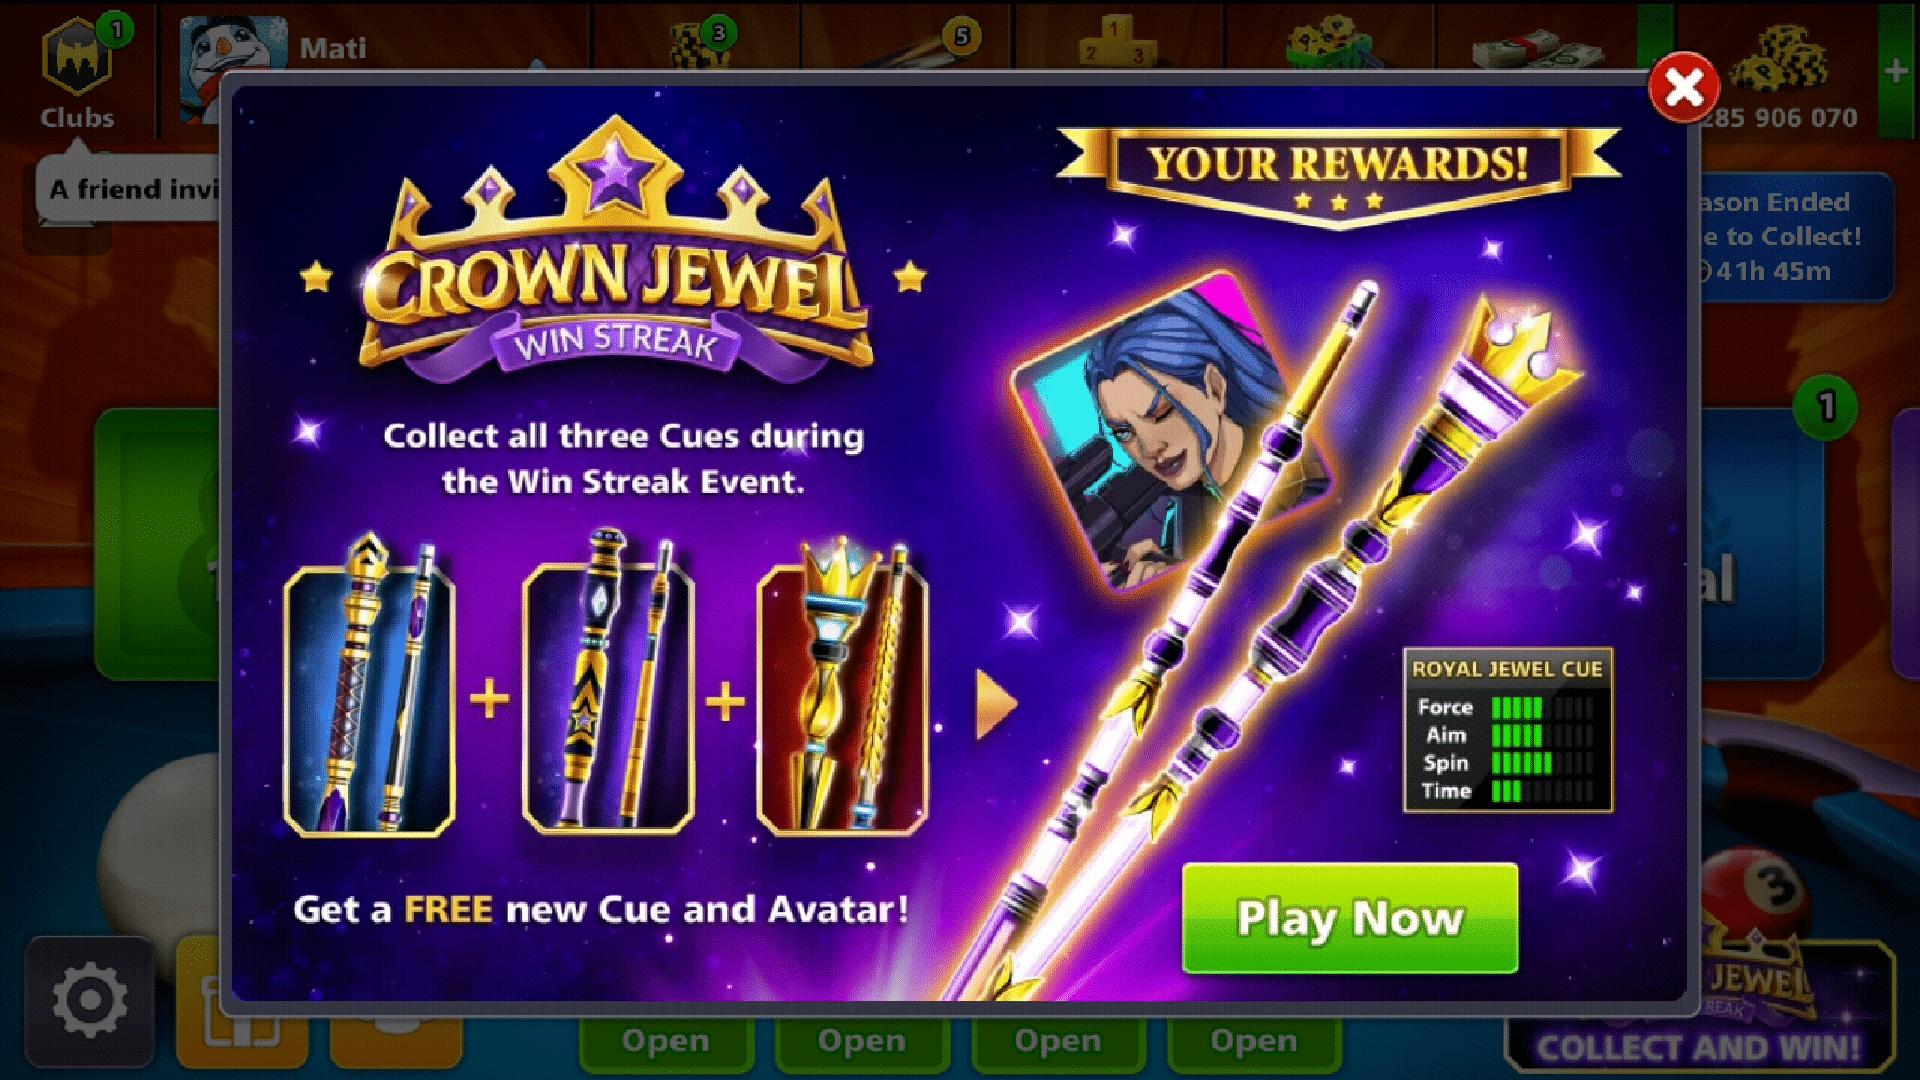 8 ball pool crown jewel